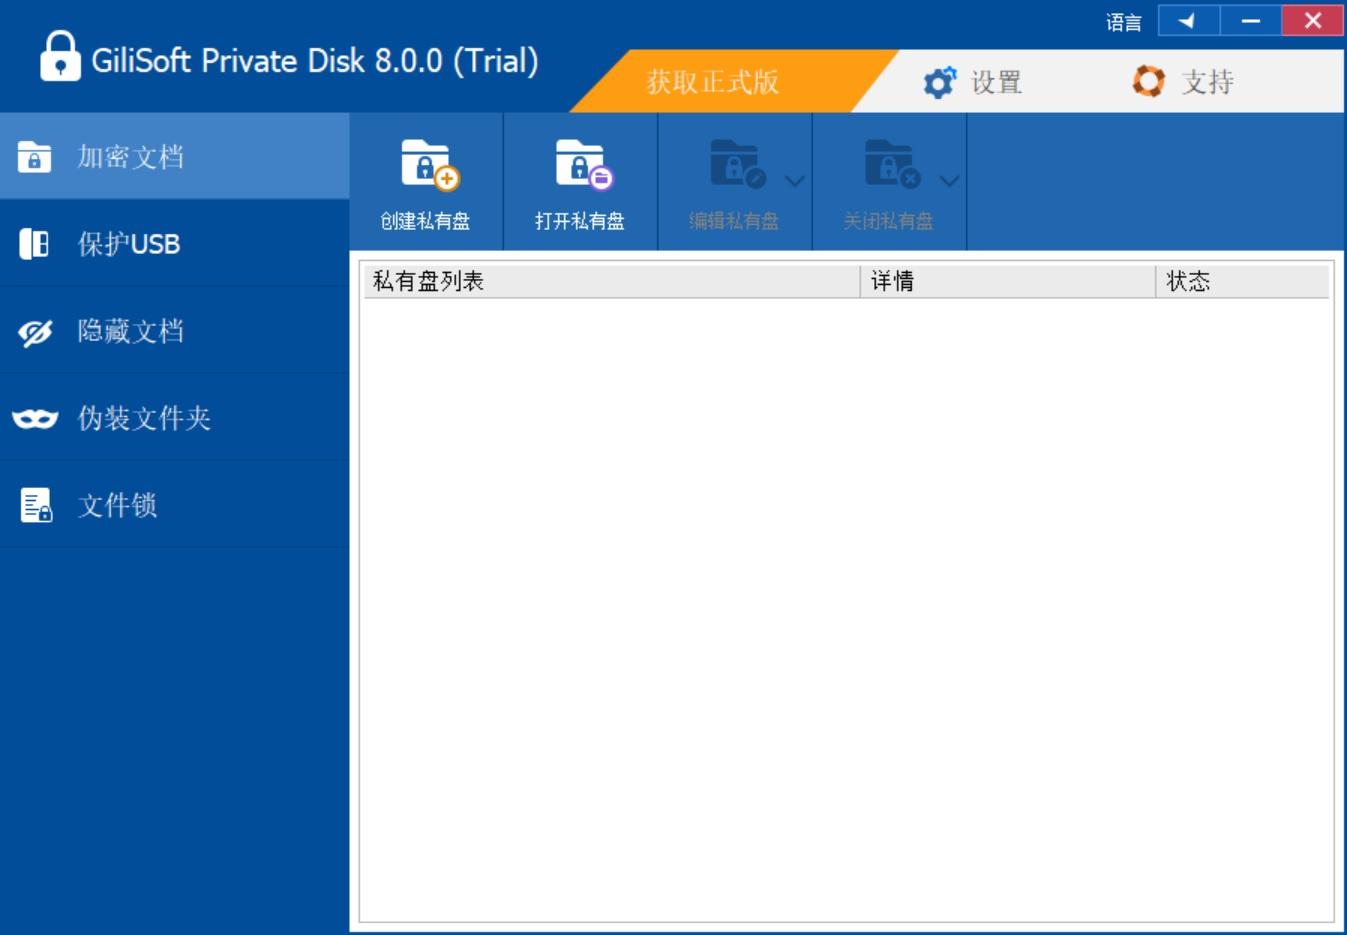 GiliSoft Private Disk.jpg